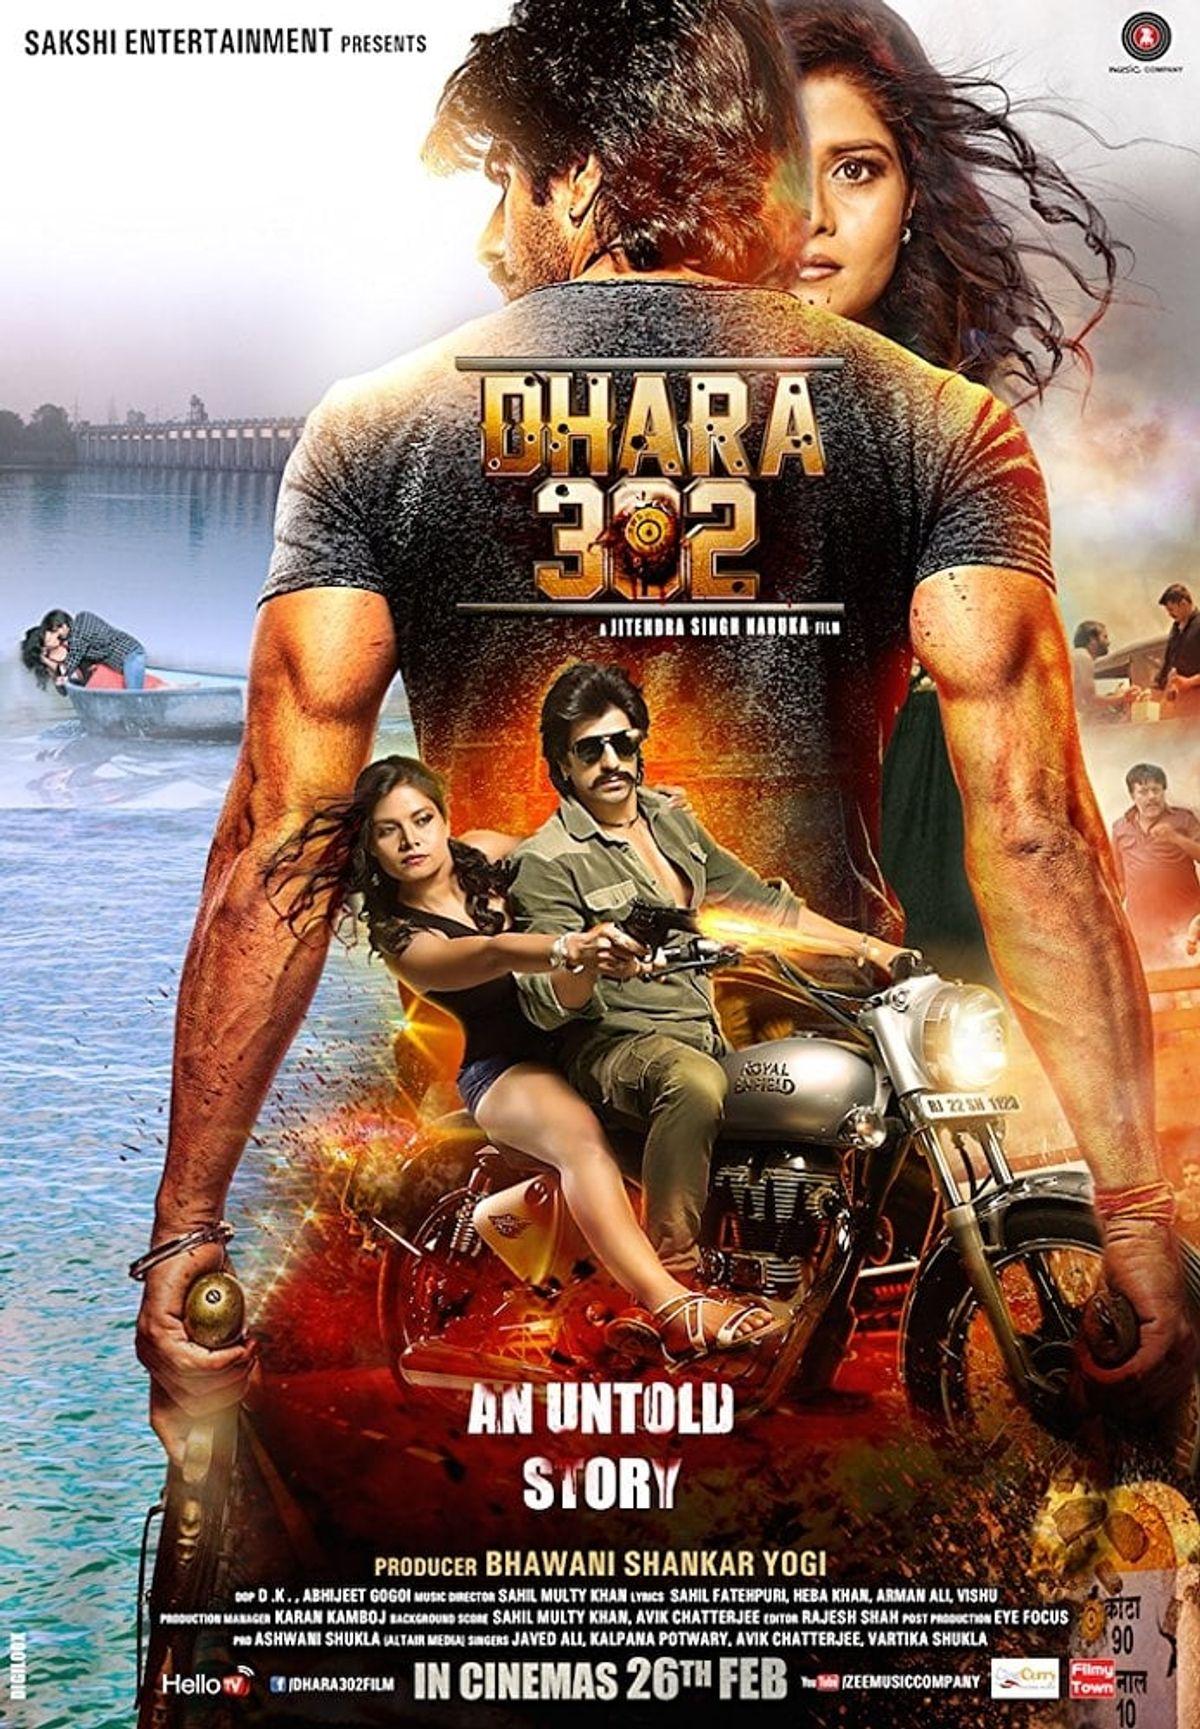 Dhara 302